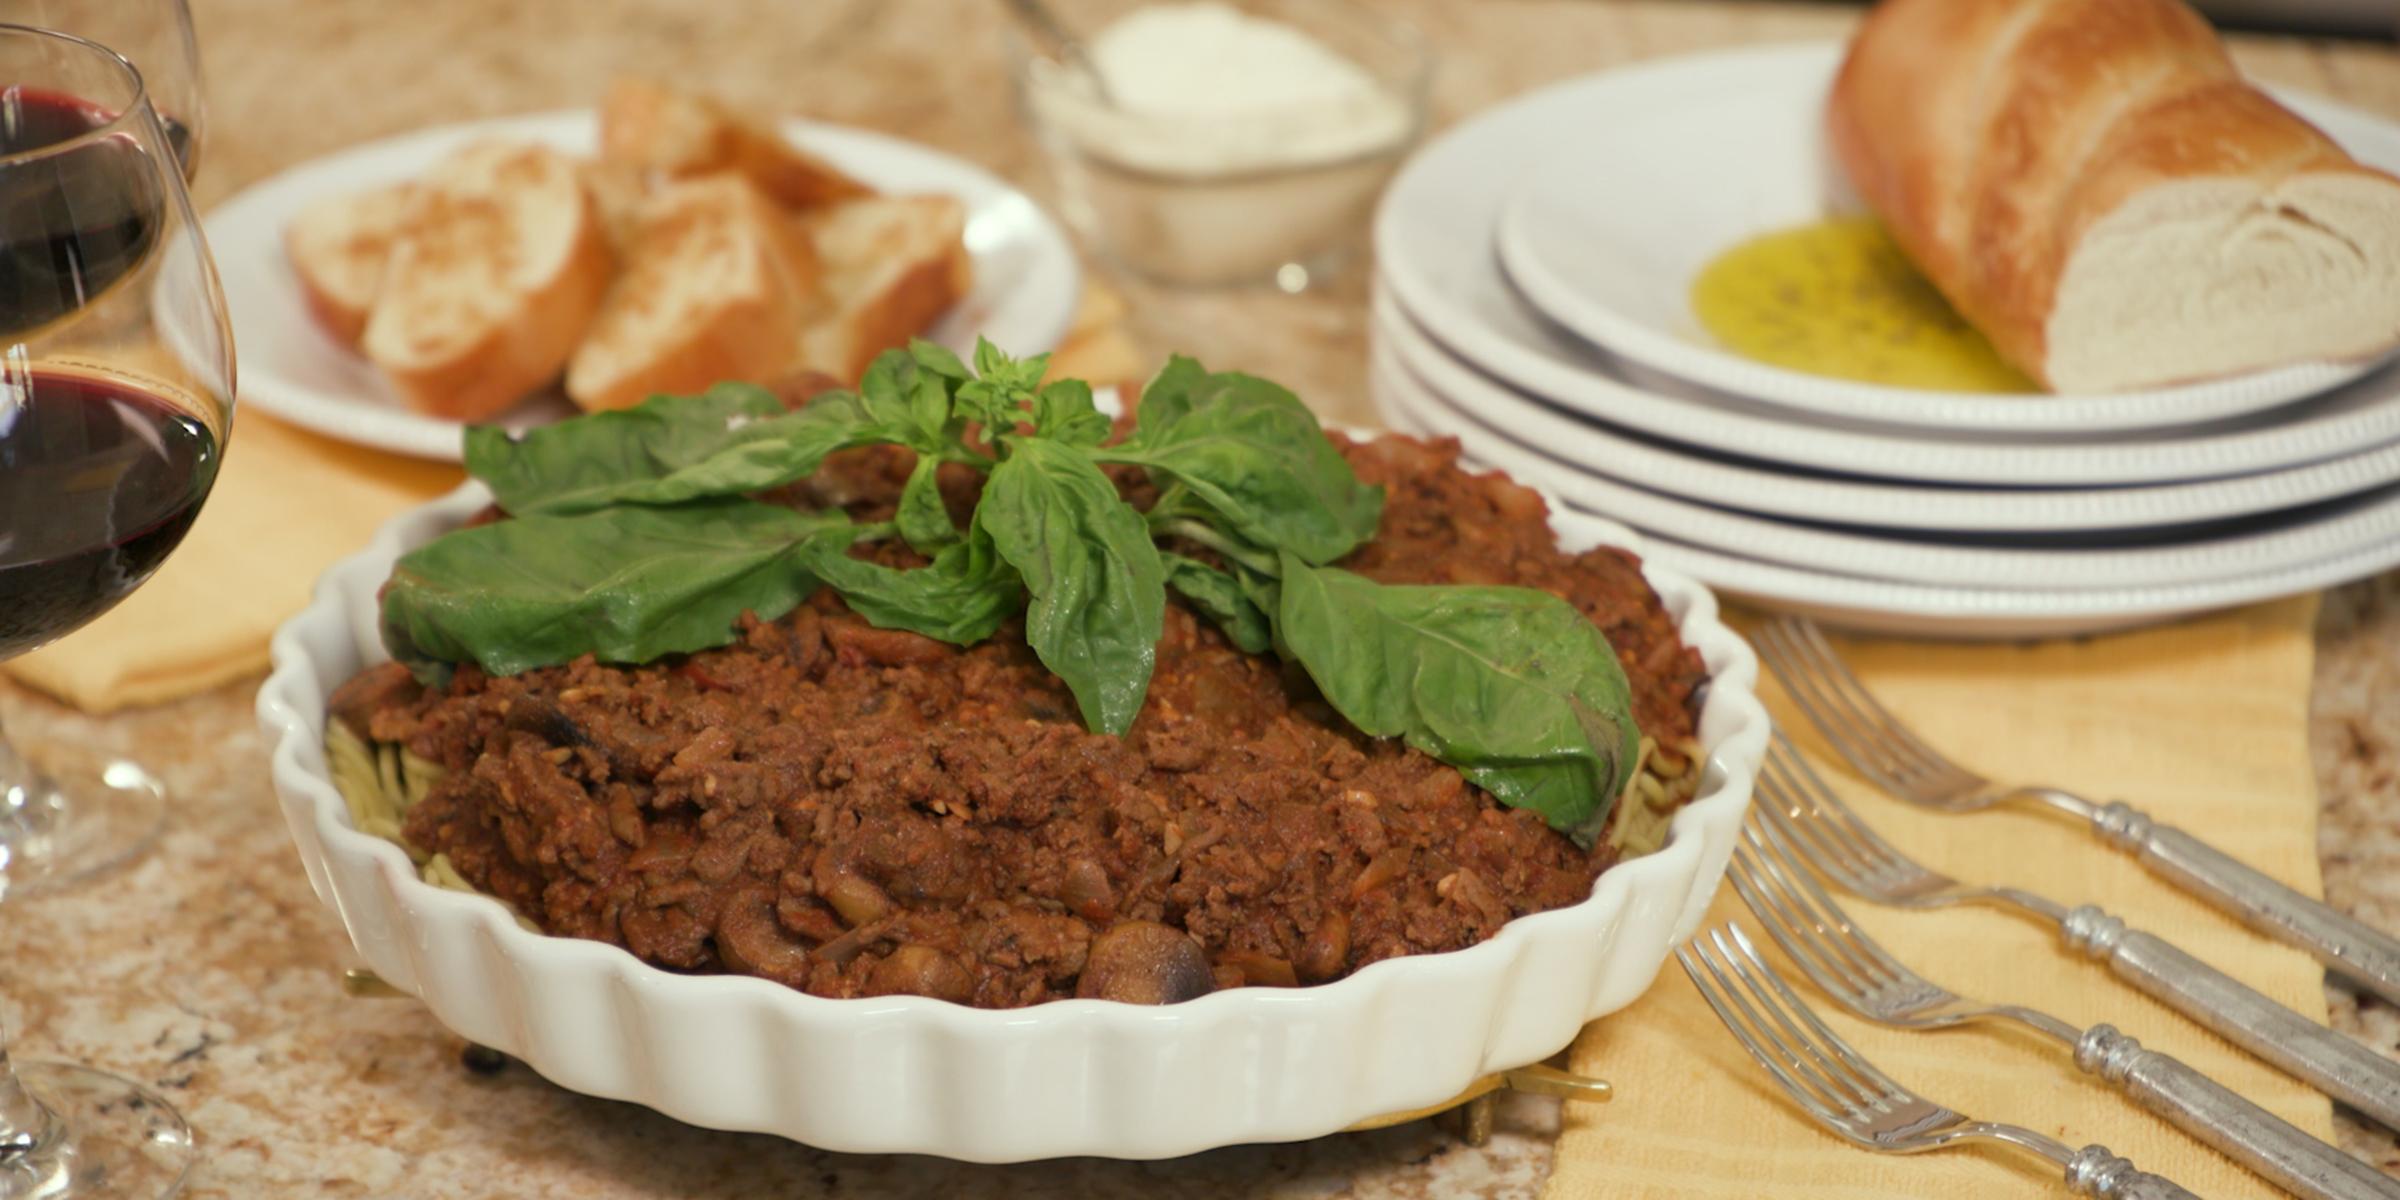 Make and freeze dinner easily with Sandra Lee's savory spaghetti sauce